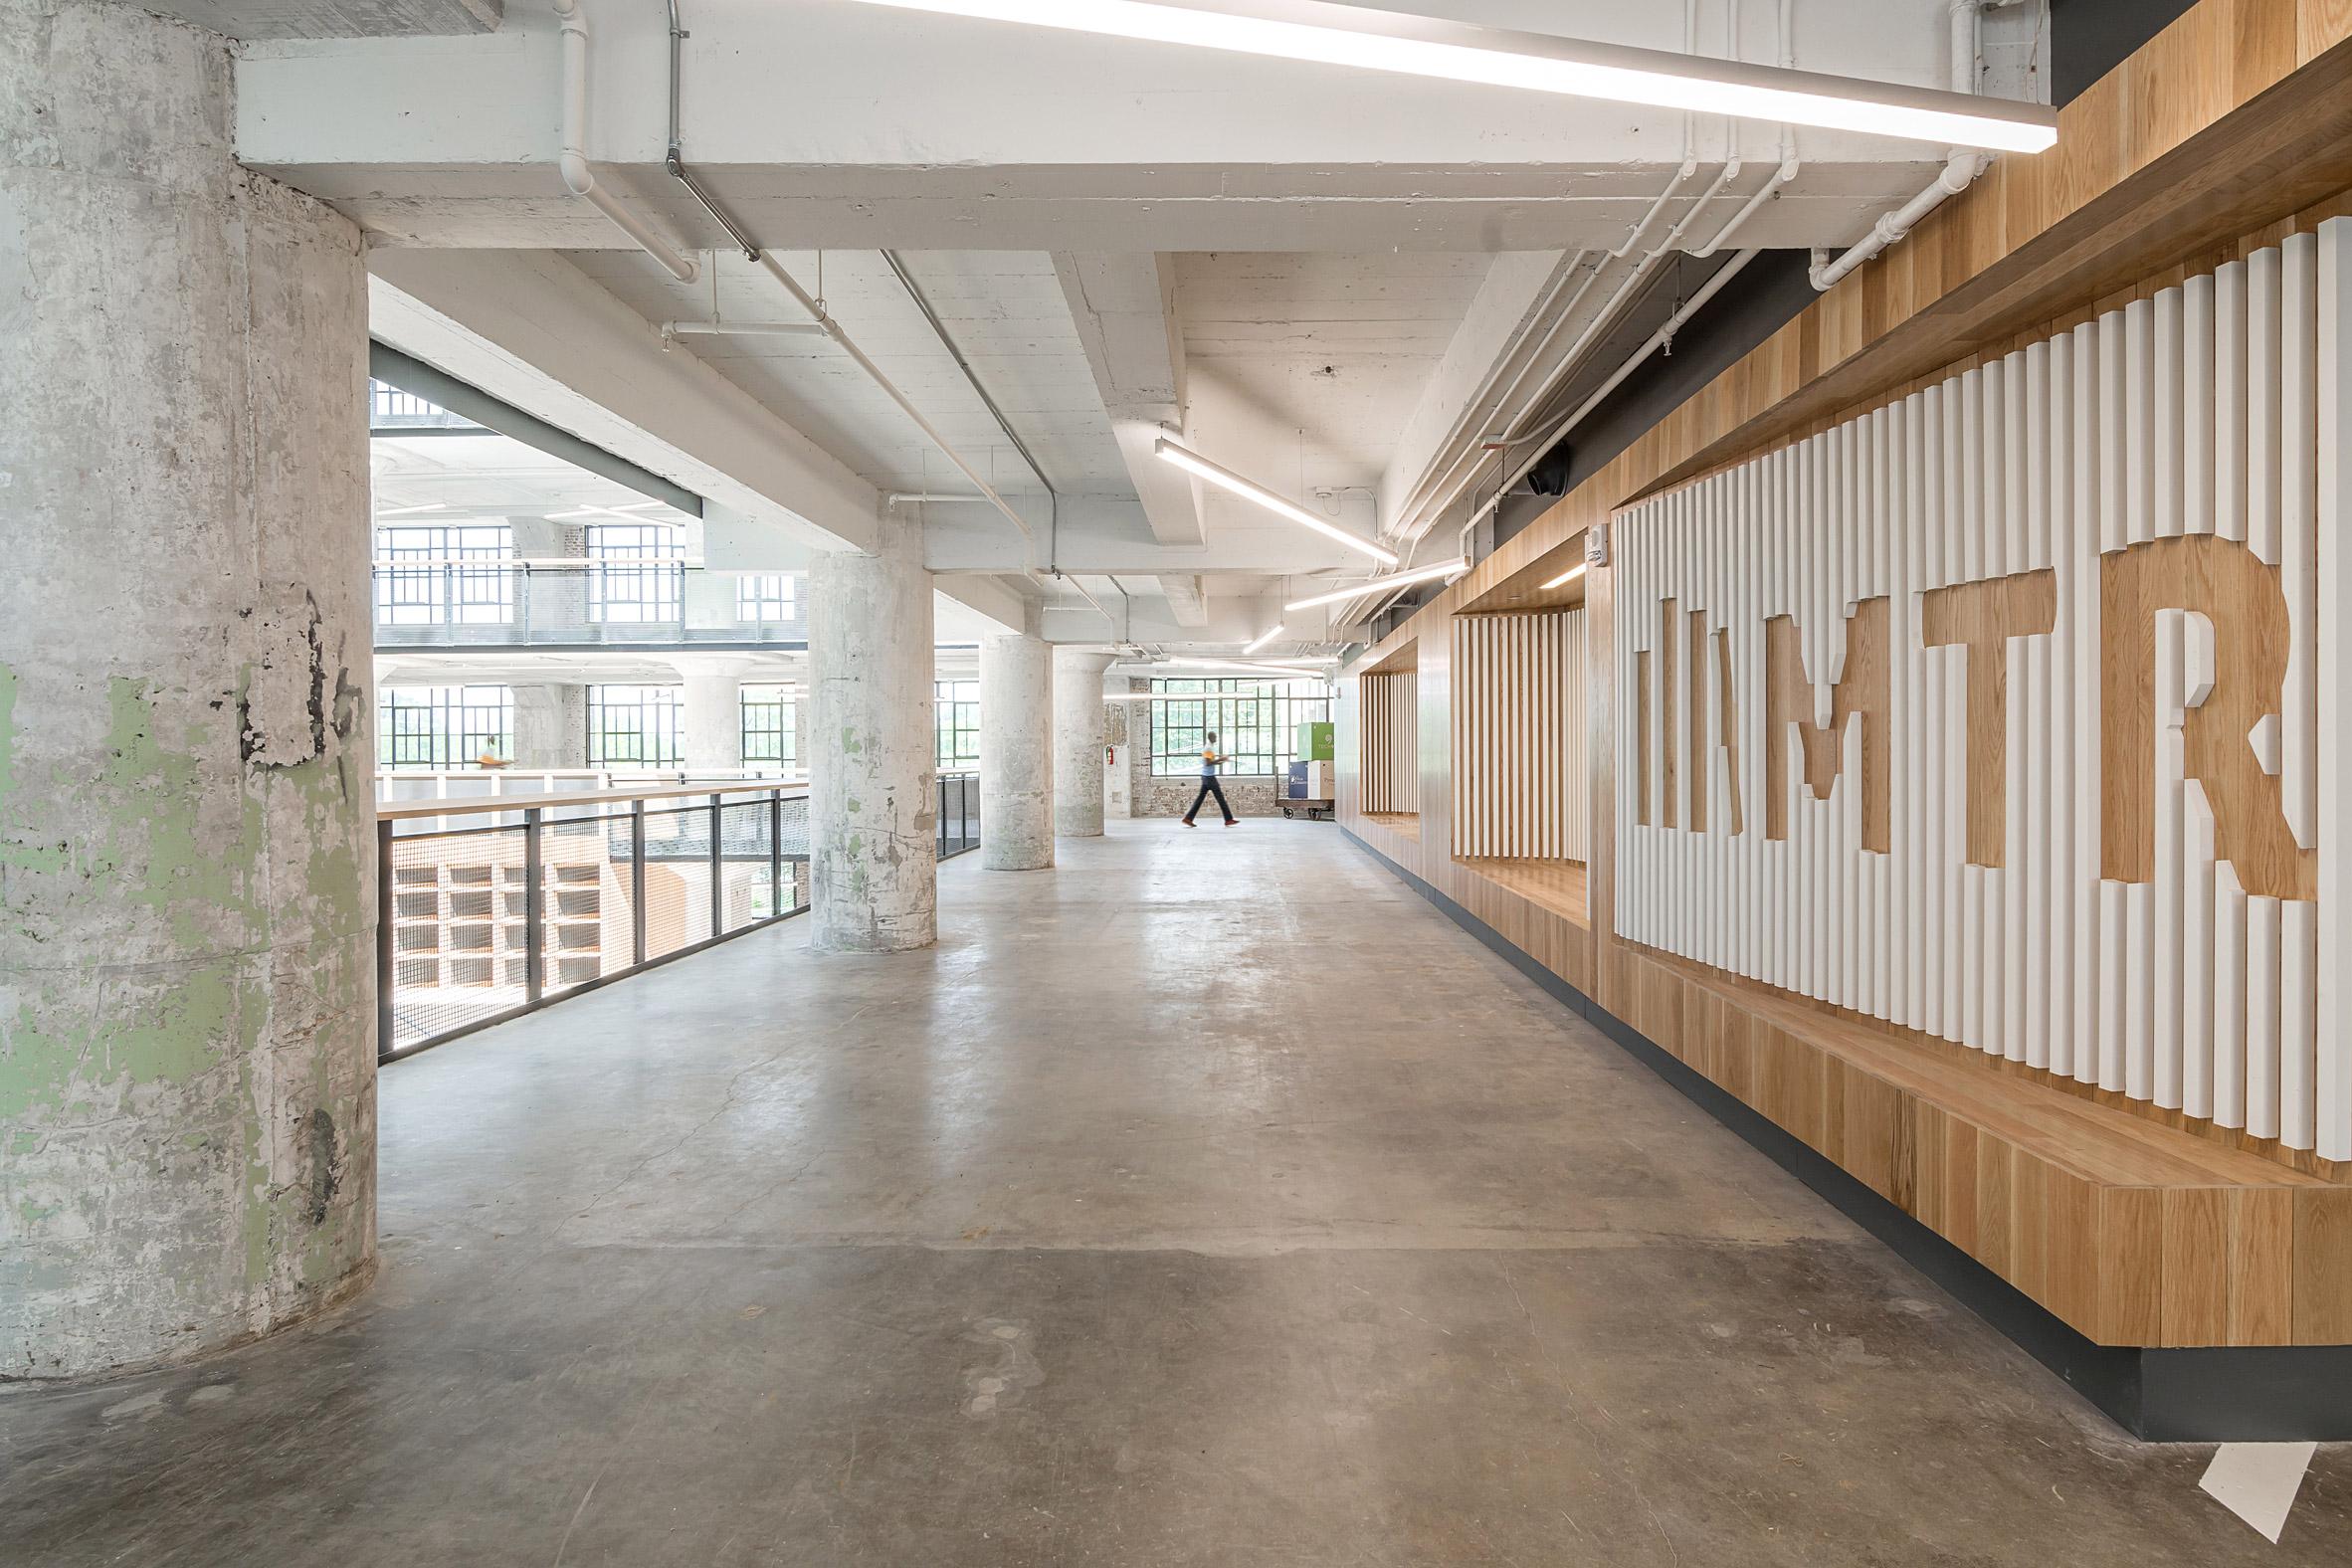 Archimania transforms part of historic Memphis warehouse into teacher training centre